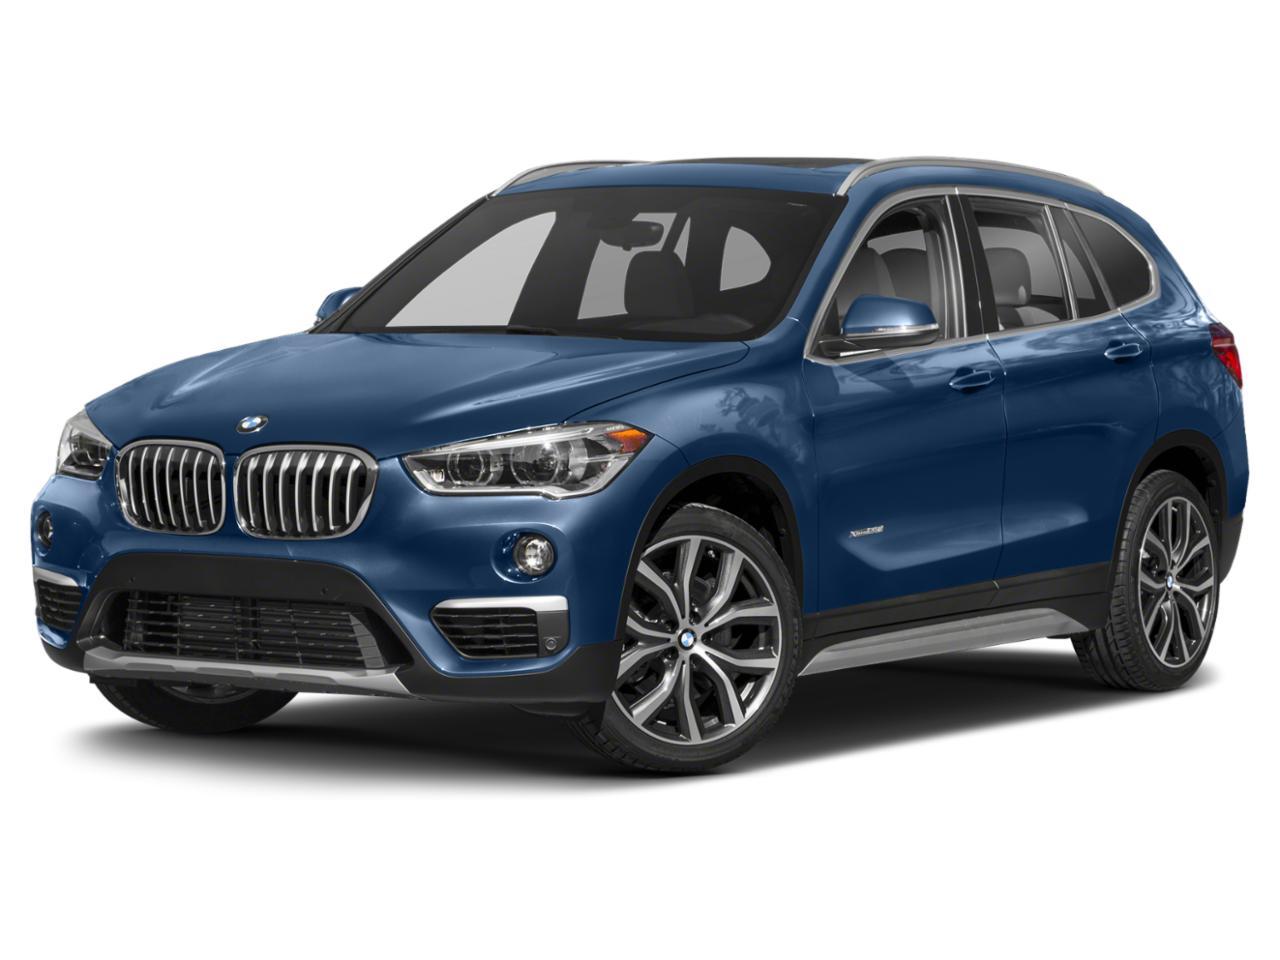 2018 BMW X1 xDrive28i Vehicle Photo in Cape May Court House, NJ 08210